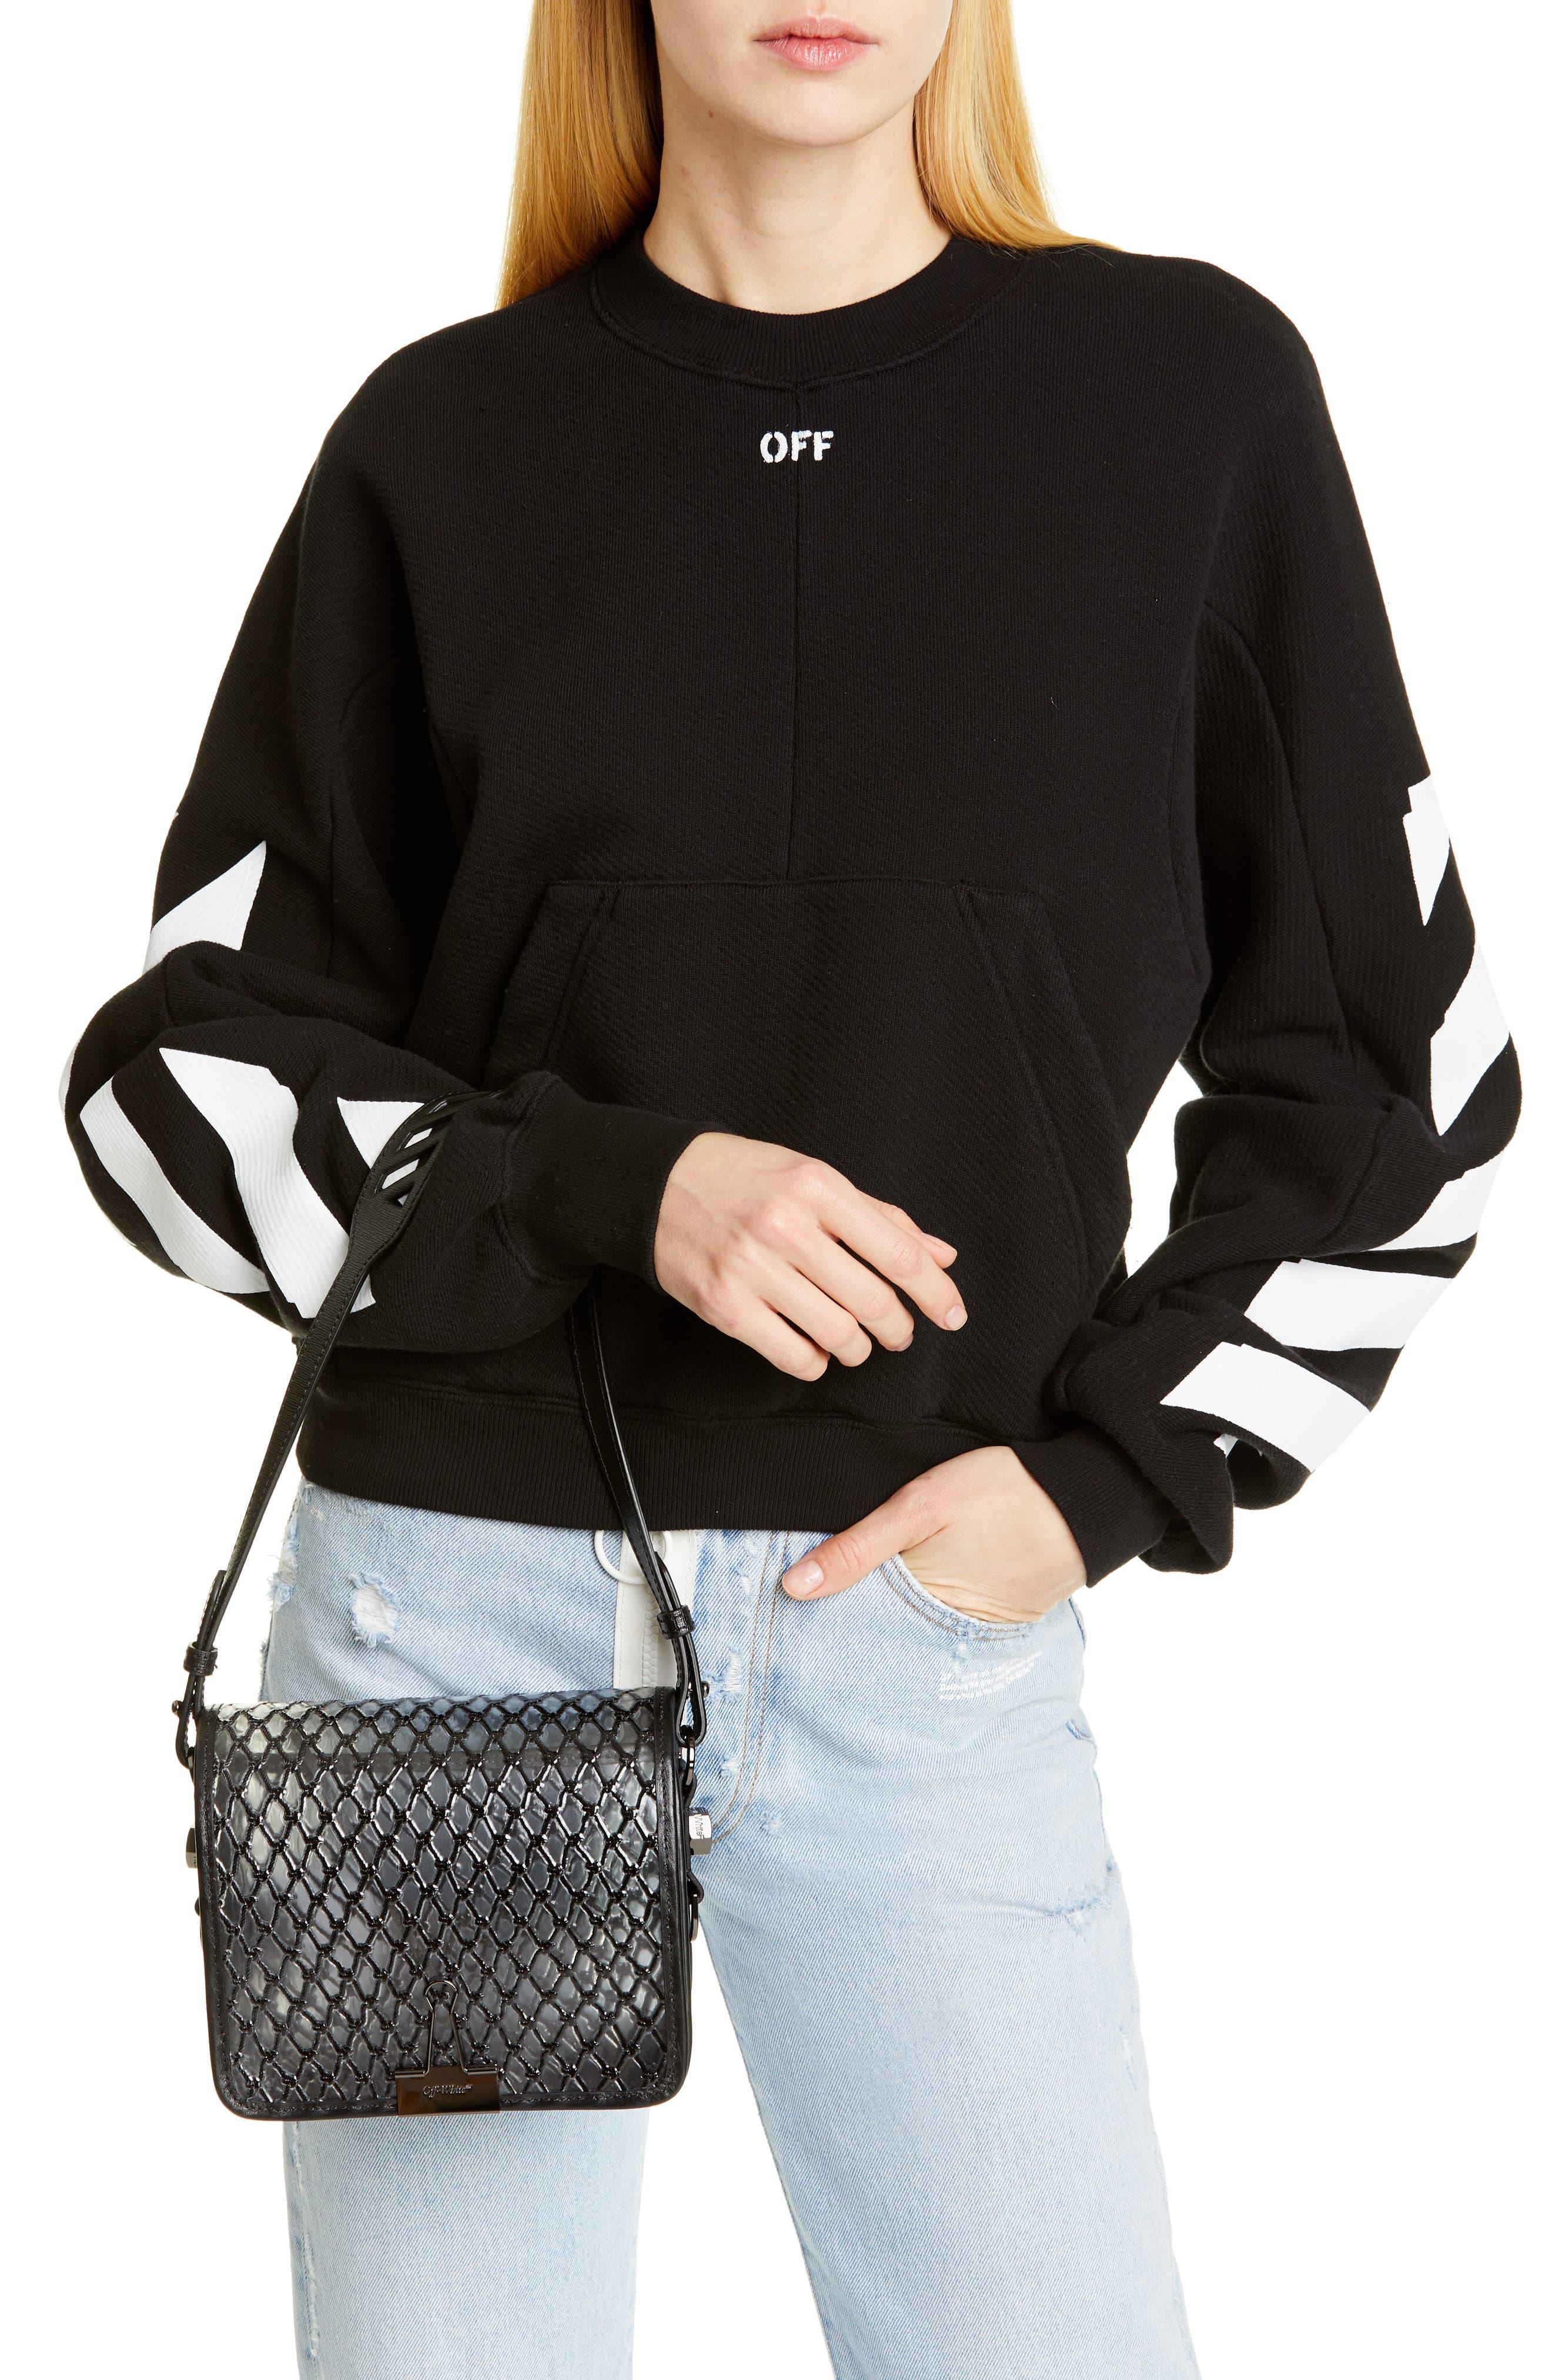 OFF-WHITE, Net PVC Flap Bag, Alternate thumbnail 3, color, BLACK